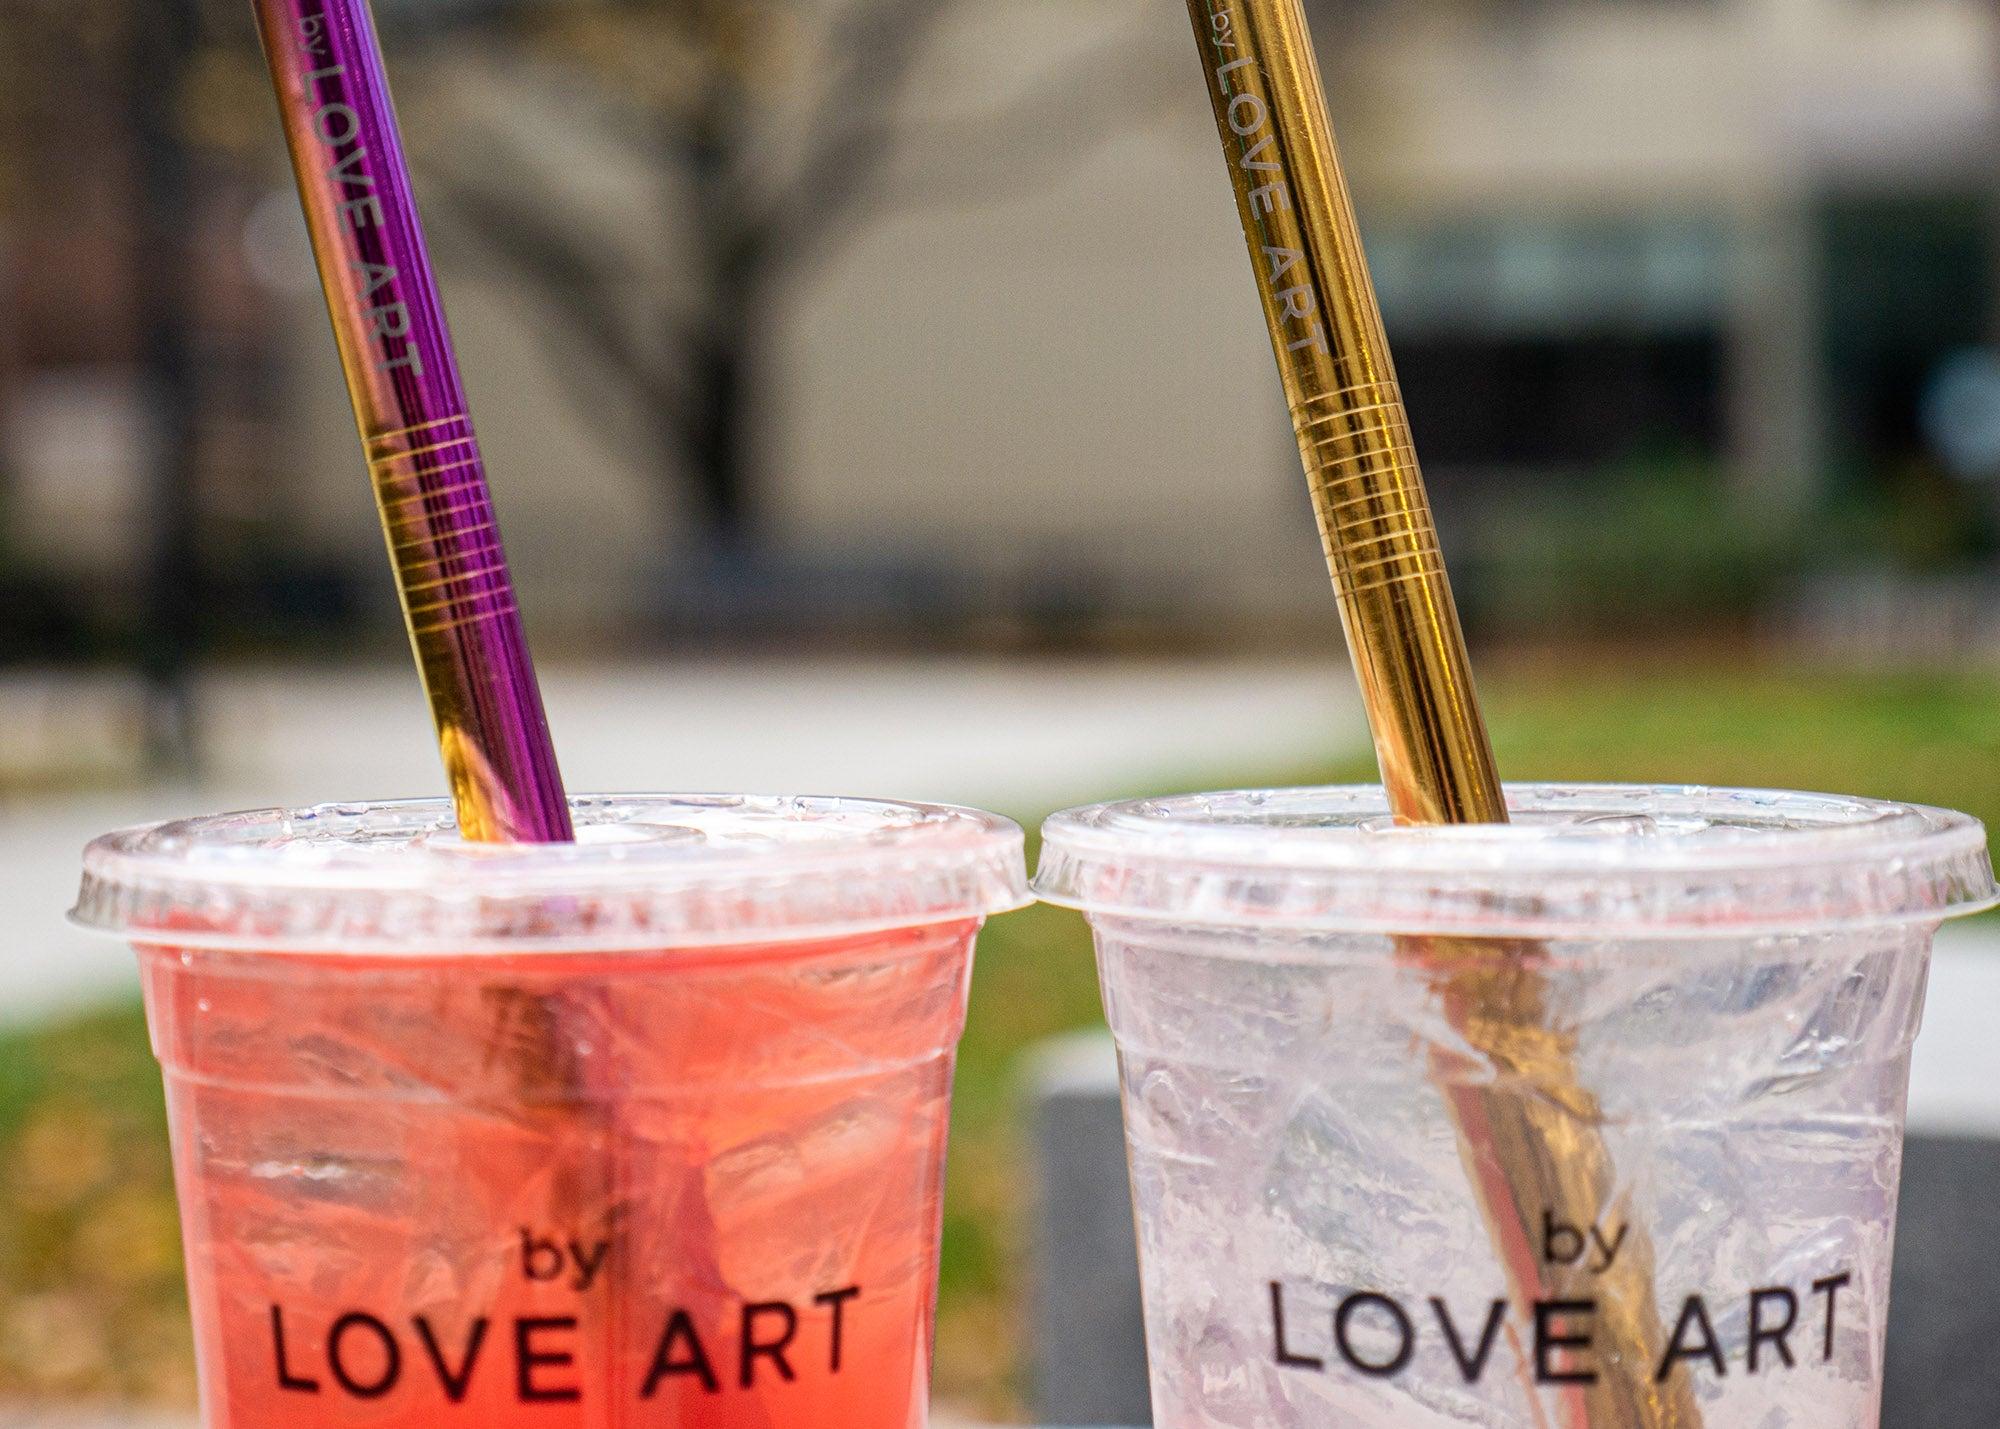 Love Art drinks